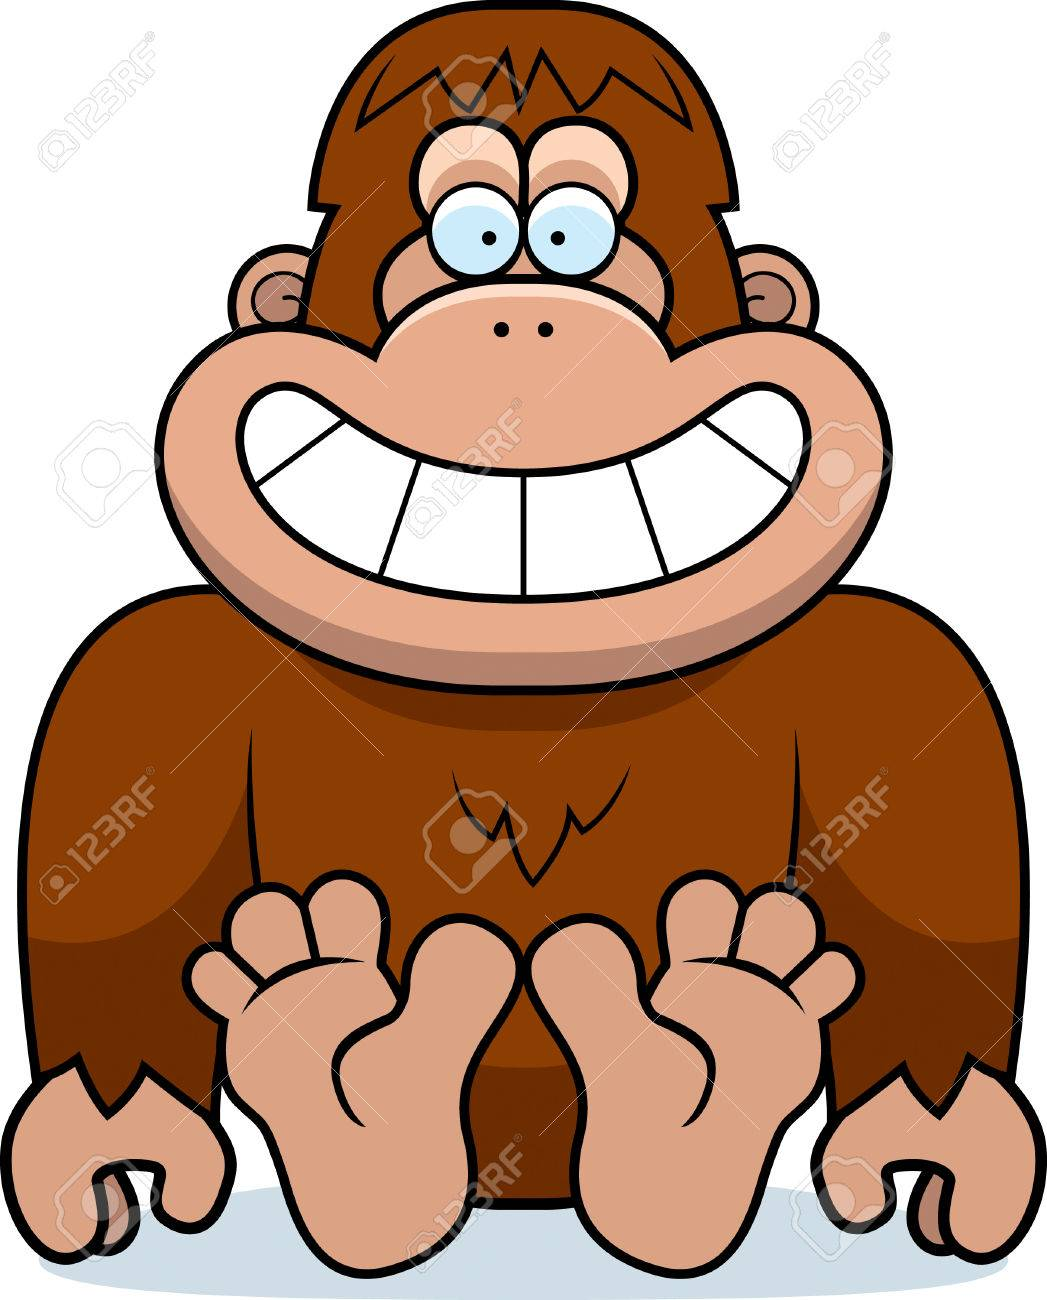 a cartoon illustration of a bigfoot sitting royalty free cliparts rh 123rf com free bigfoot clipart bigfoot clipart black and white